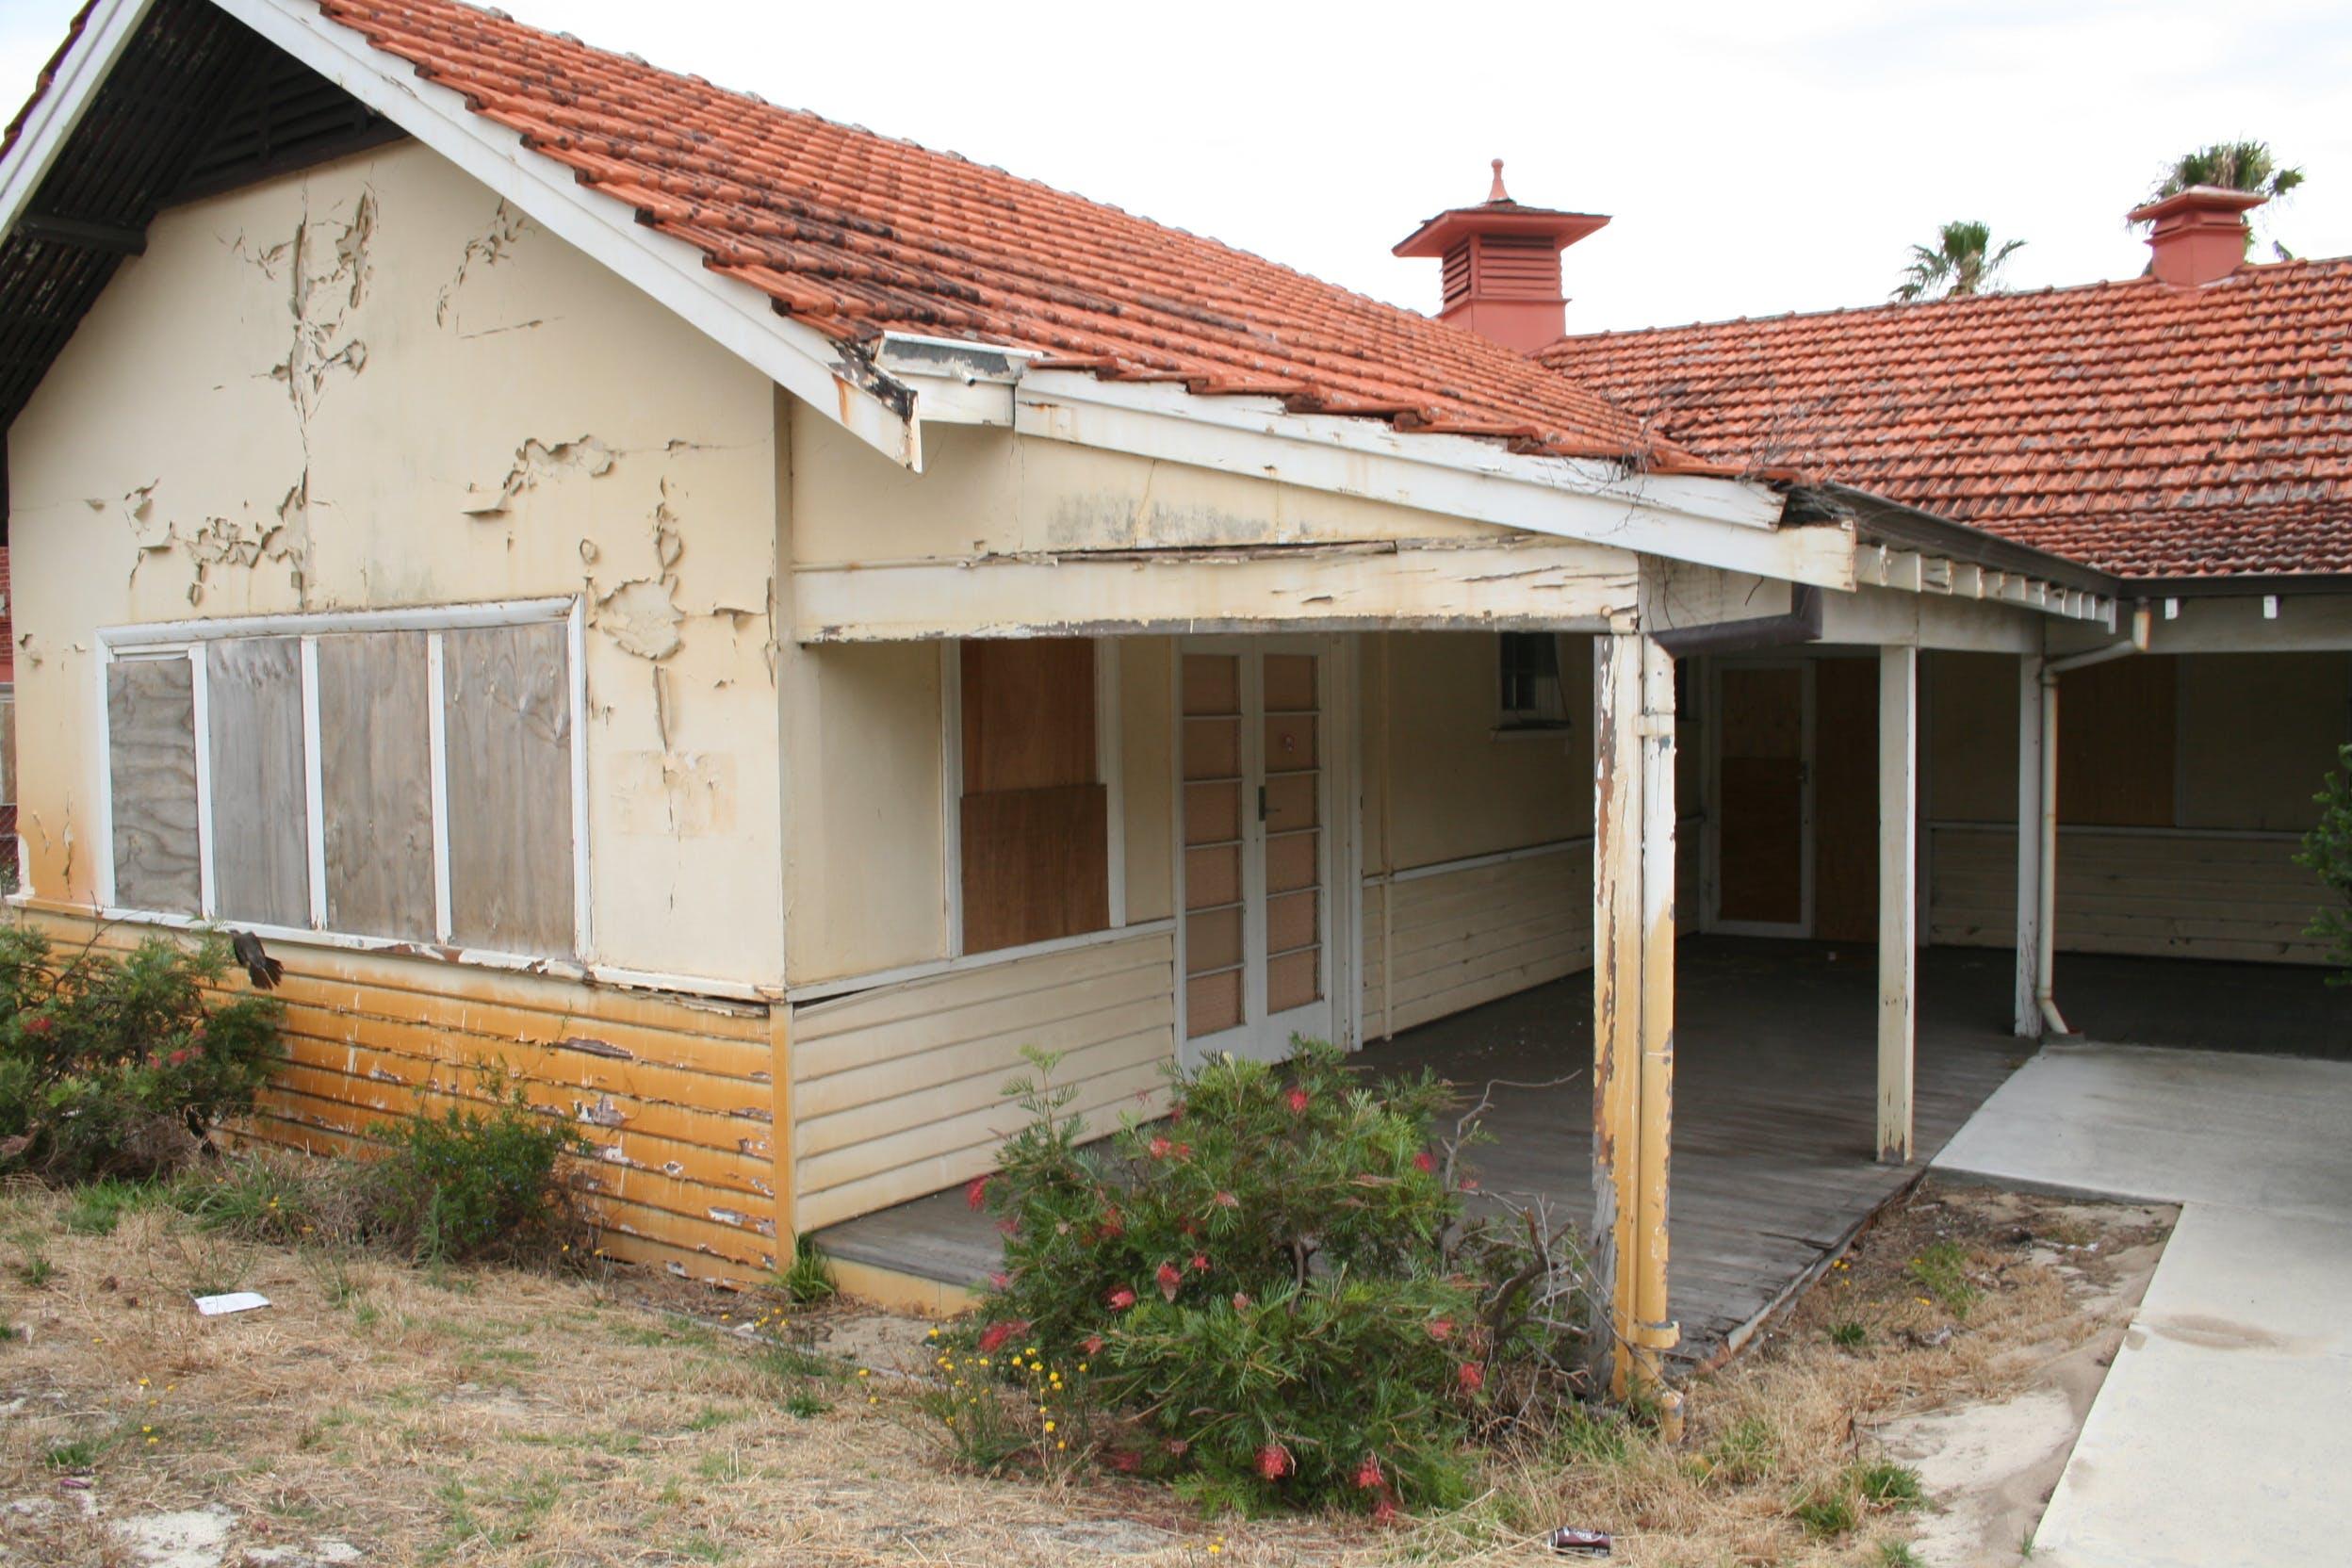 The Mildred Creak Building Present Day